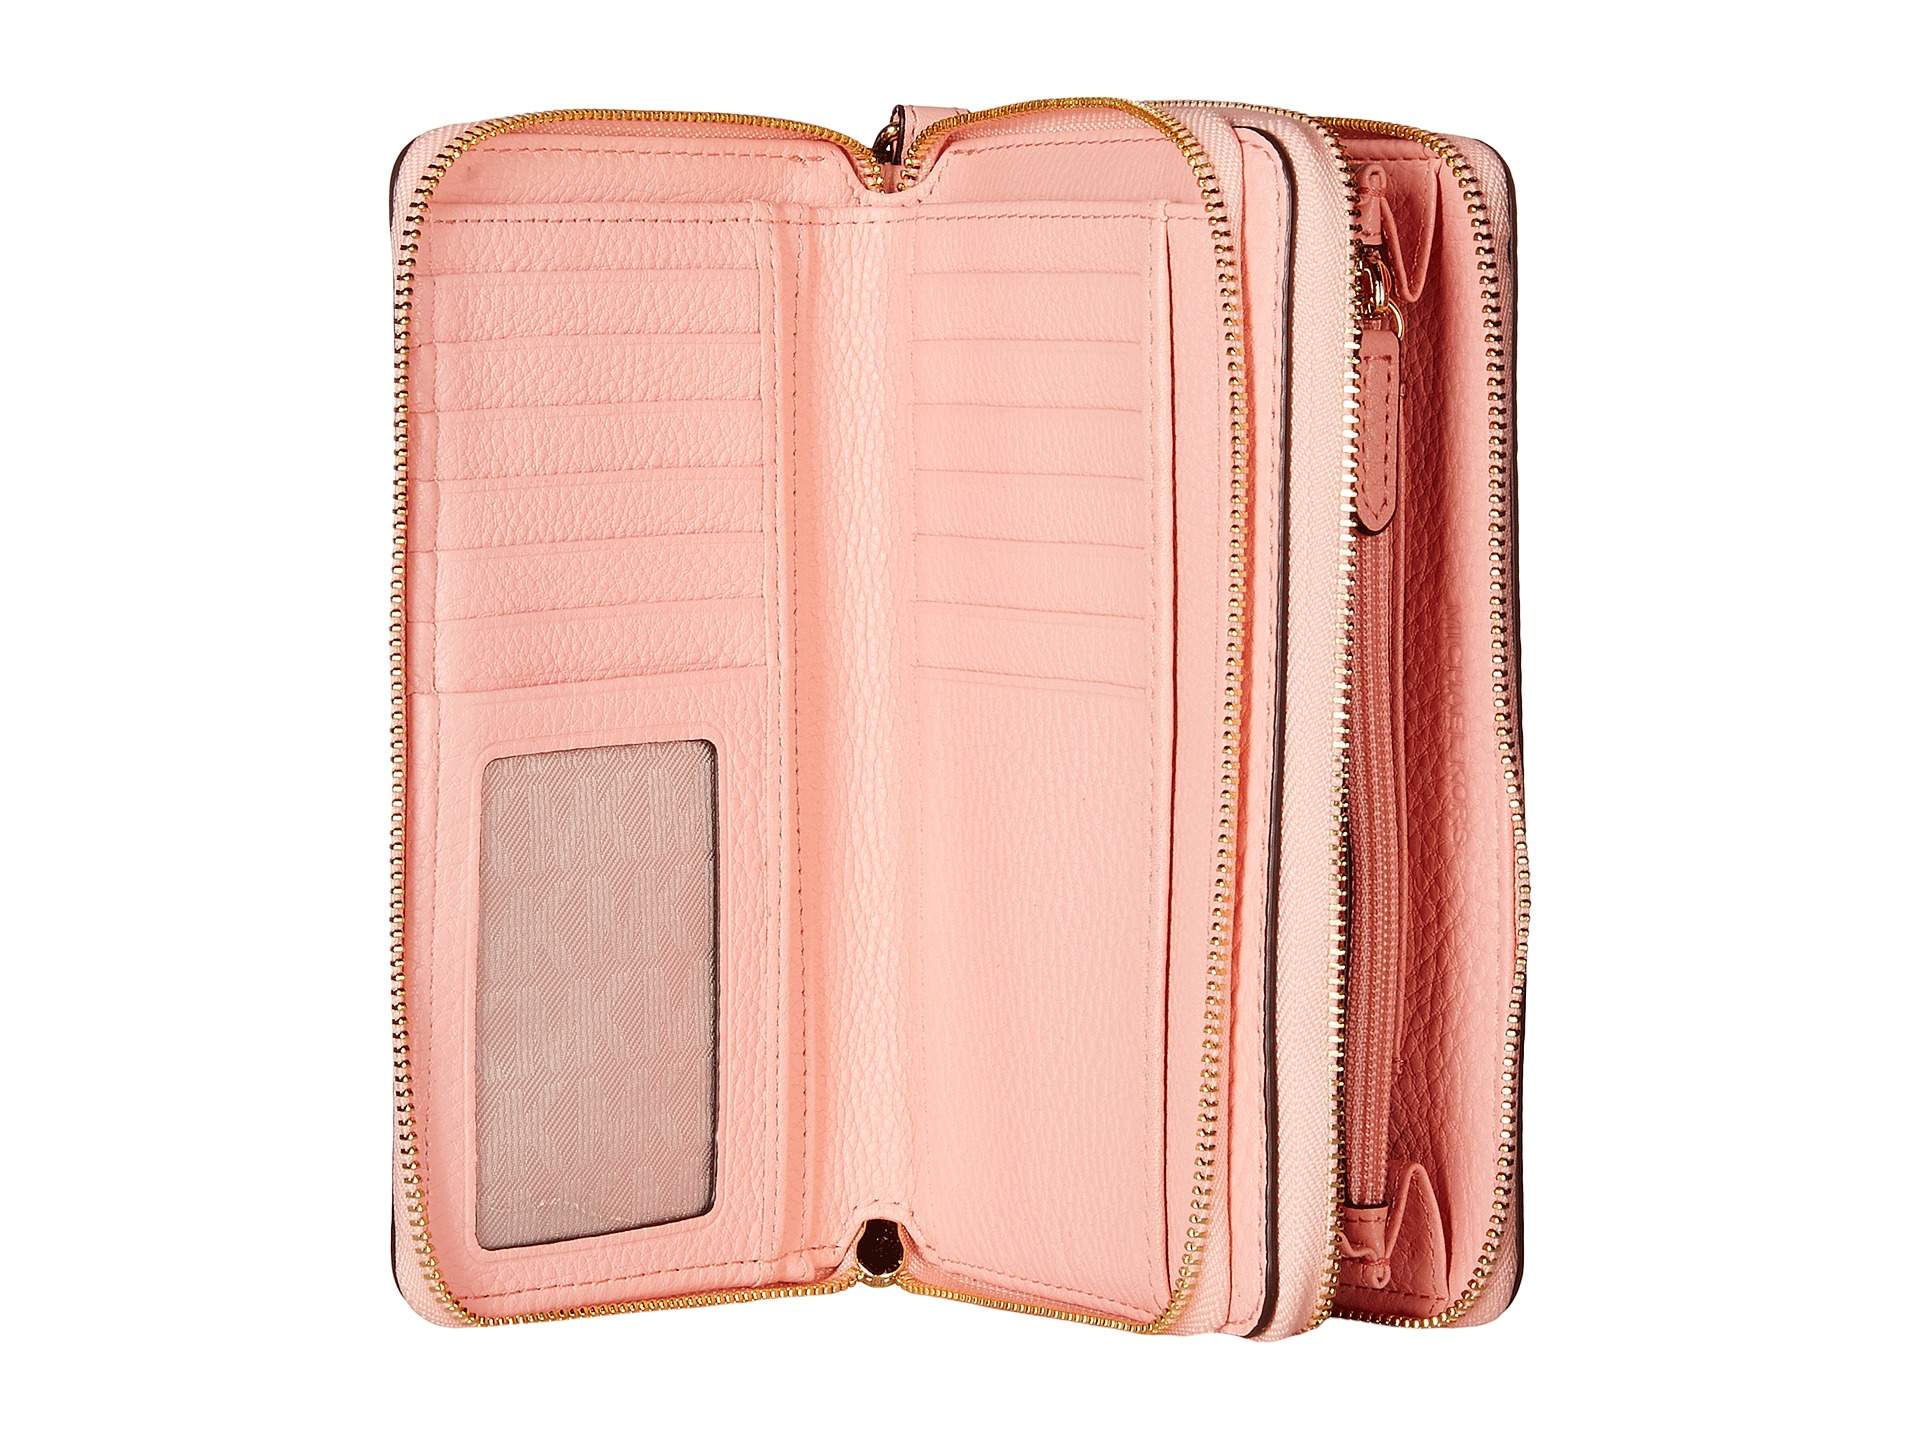 065447ea7038 Lyst - MICHAEL Michael Kors Adele Large Flat Multifunction Phone Case in  Pink